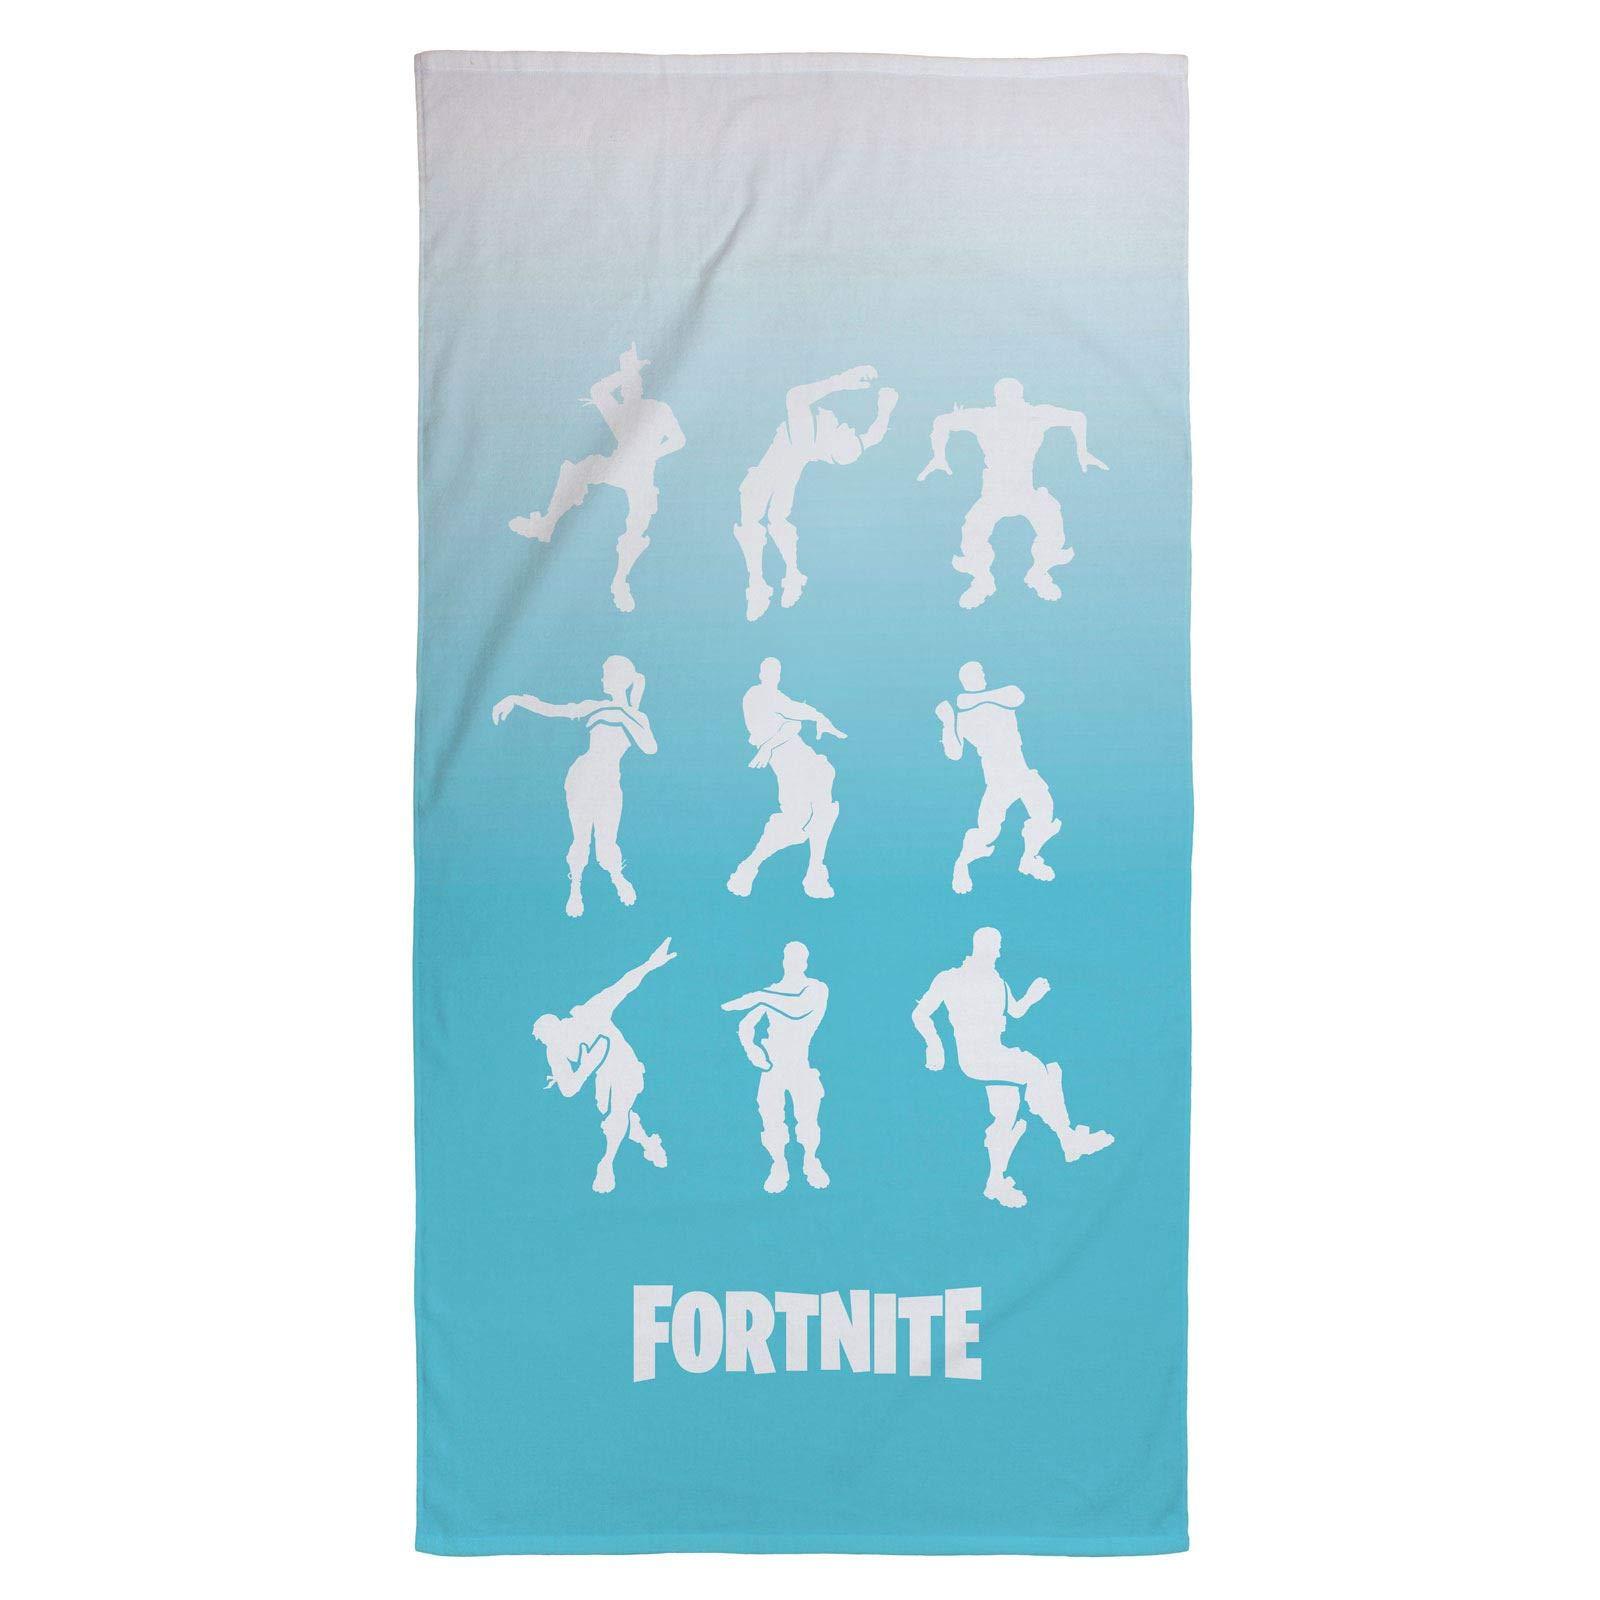 Fortnite Emotes Dance Kids Bath/Pool/Beach Towel - Super Soft & Absorbent Fade Resistant Cotton Towel, Measures 28 inch x 58 inch